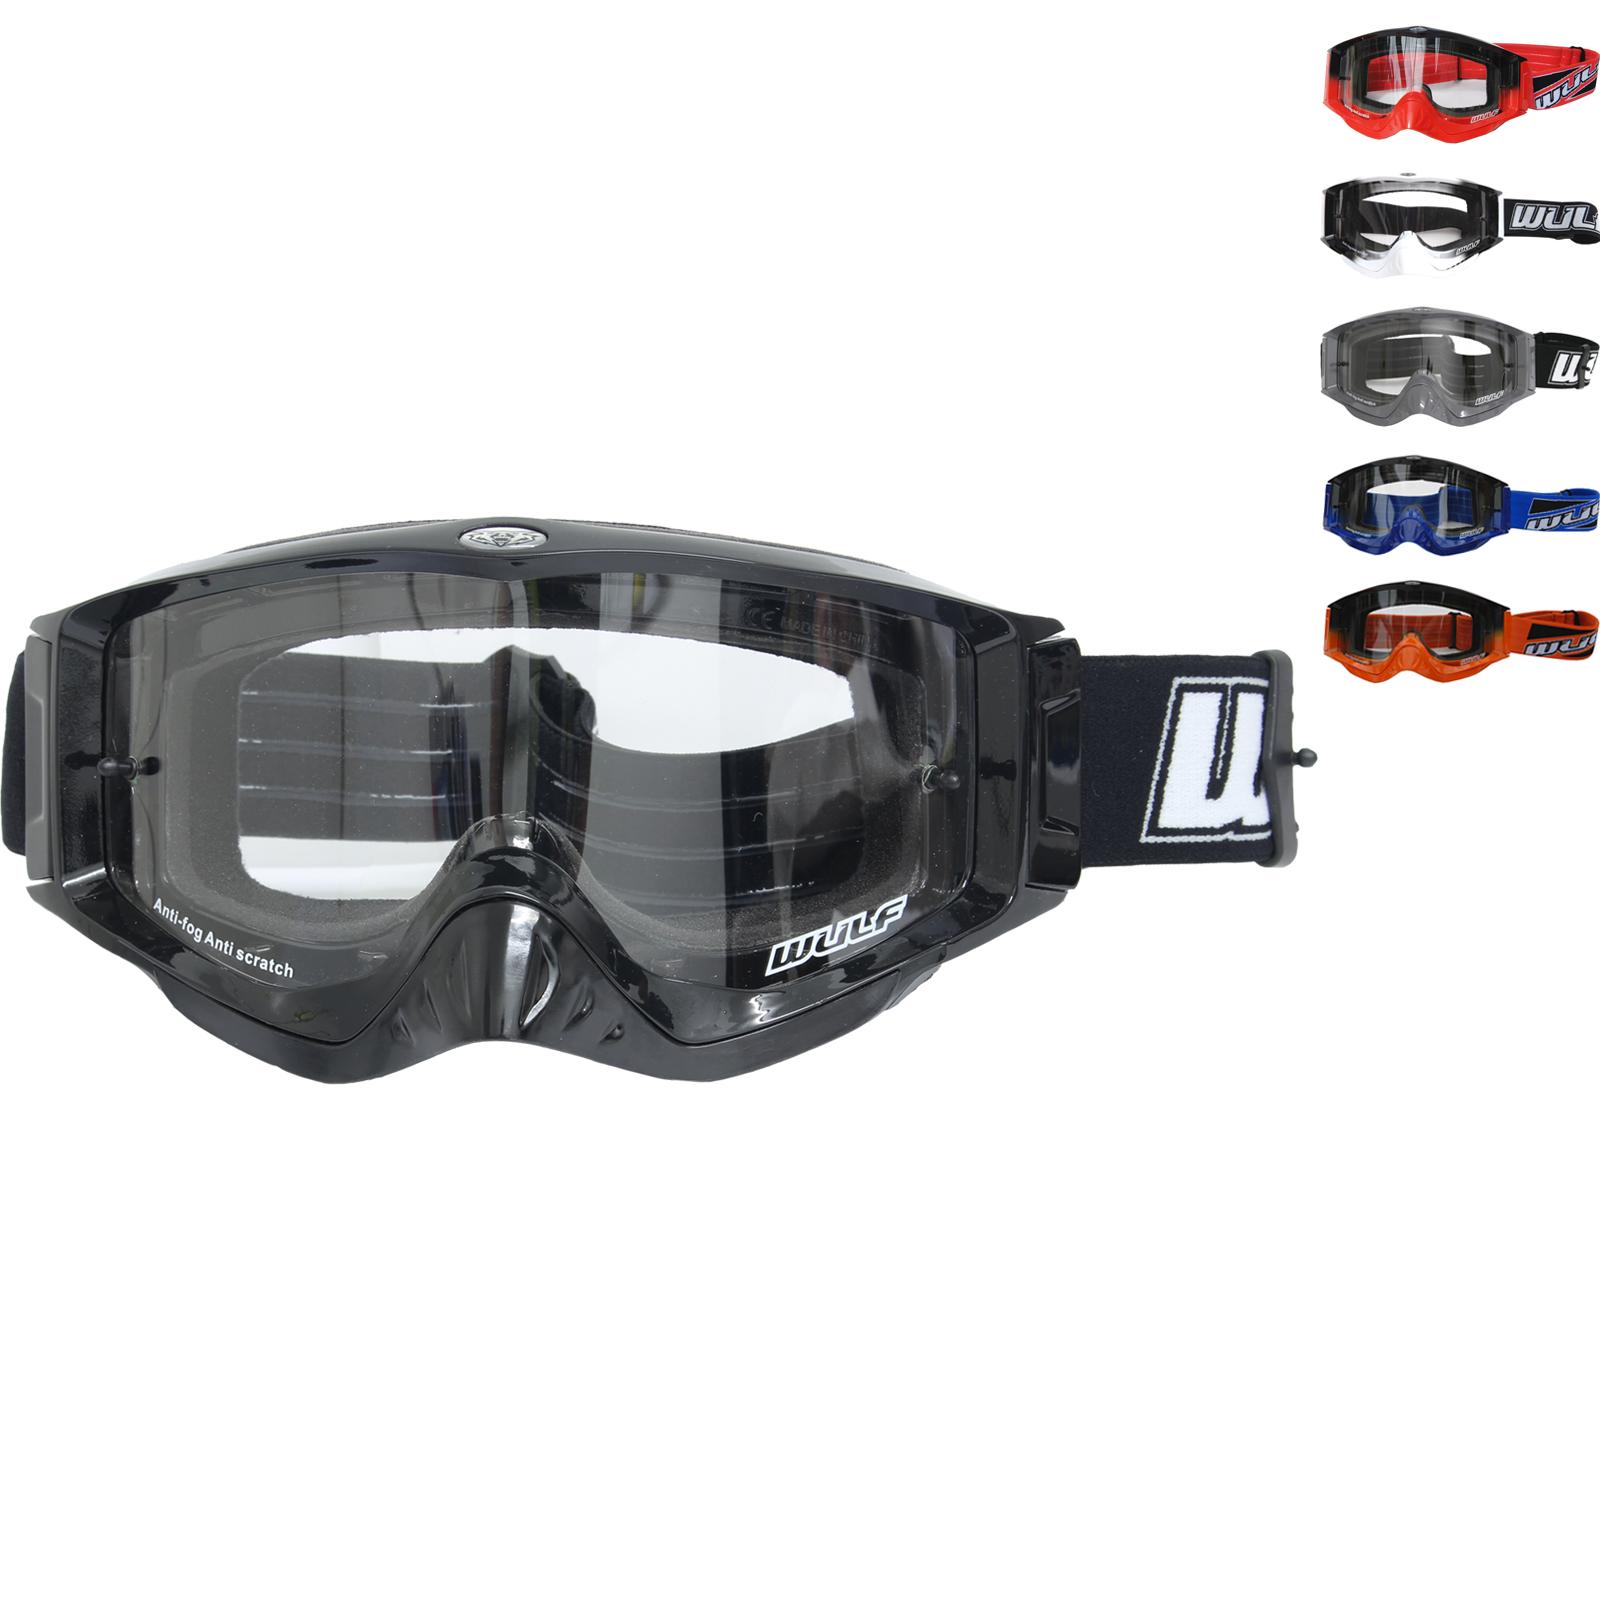 80e99c5e75ce Wulf Shade Motocross Goggles Wulfsport Off Road Enduro Helmet Anti ...